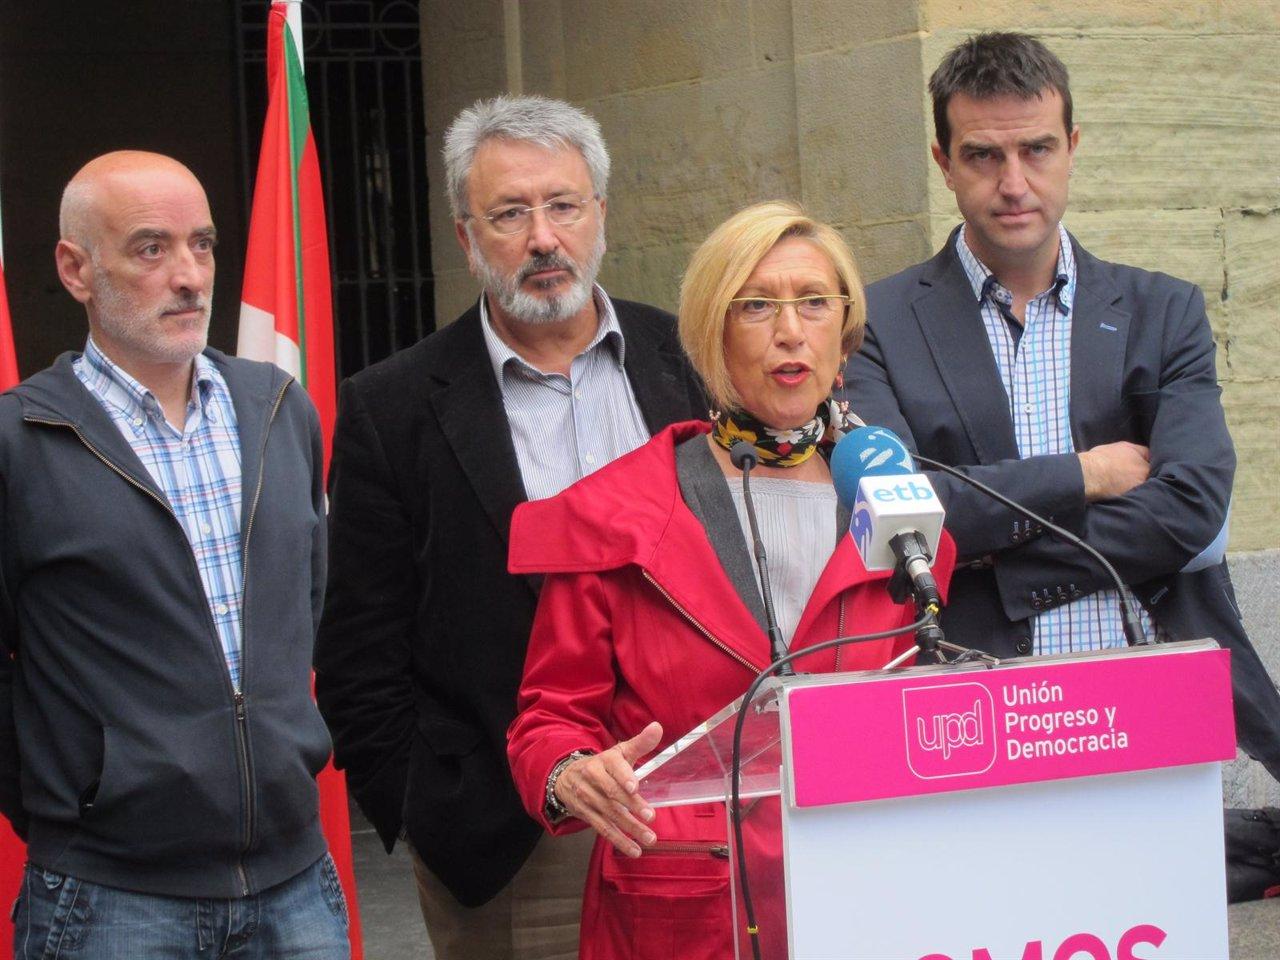 Rosa Díez, Gorka Maneiro y representantes de UPyD